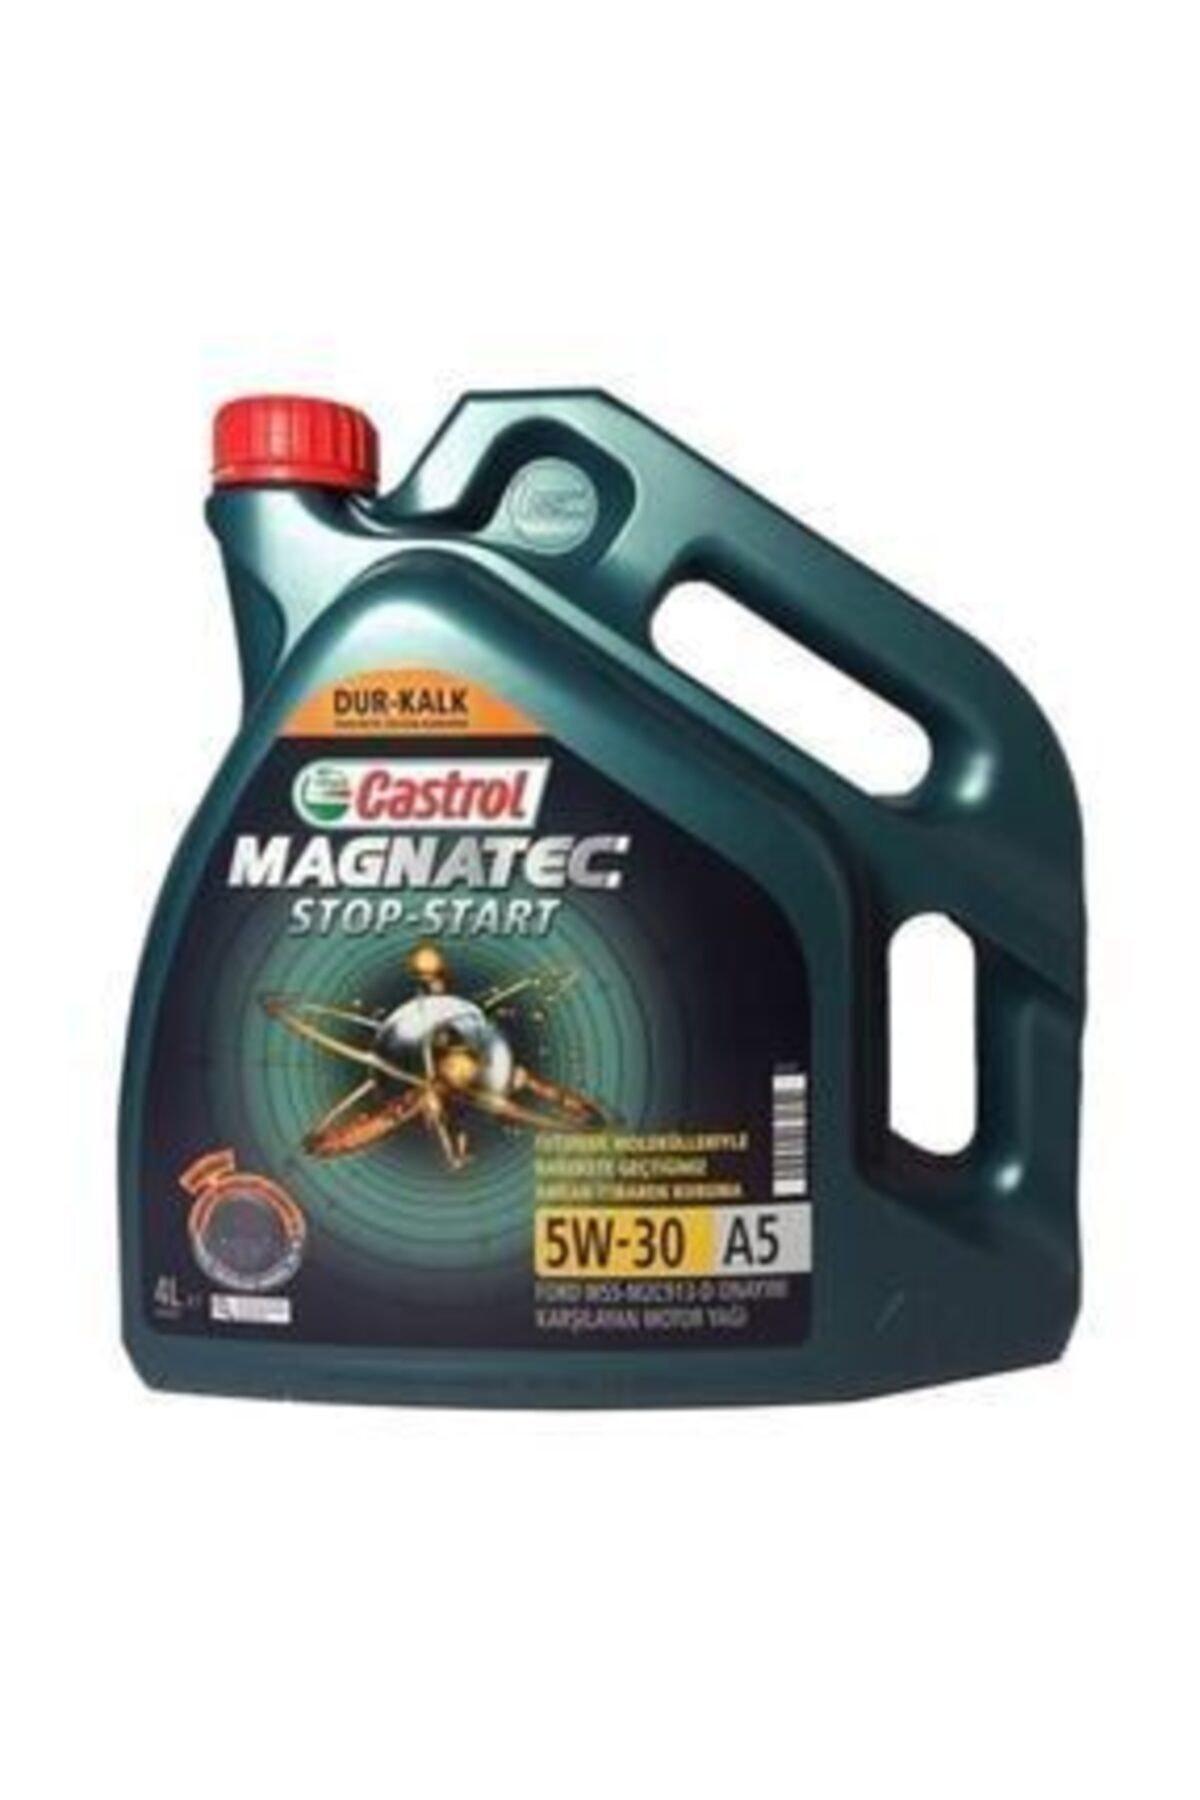 Magnatec 2021 Üretim Stop-start 5w-30 A5 4 Litre 2021 Üretim Motor Yağ